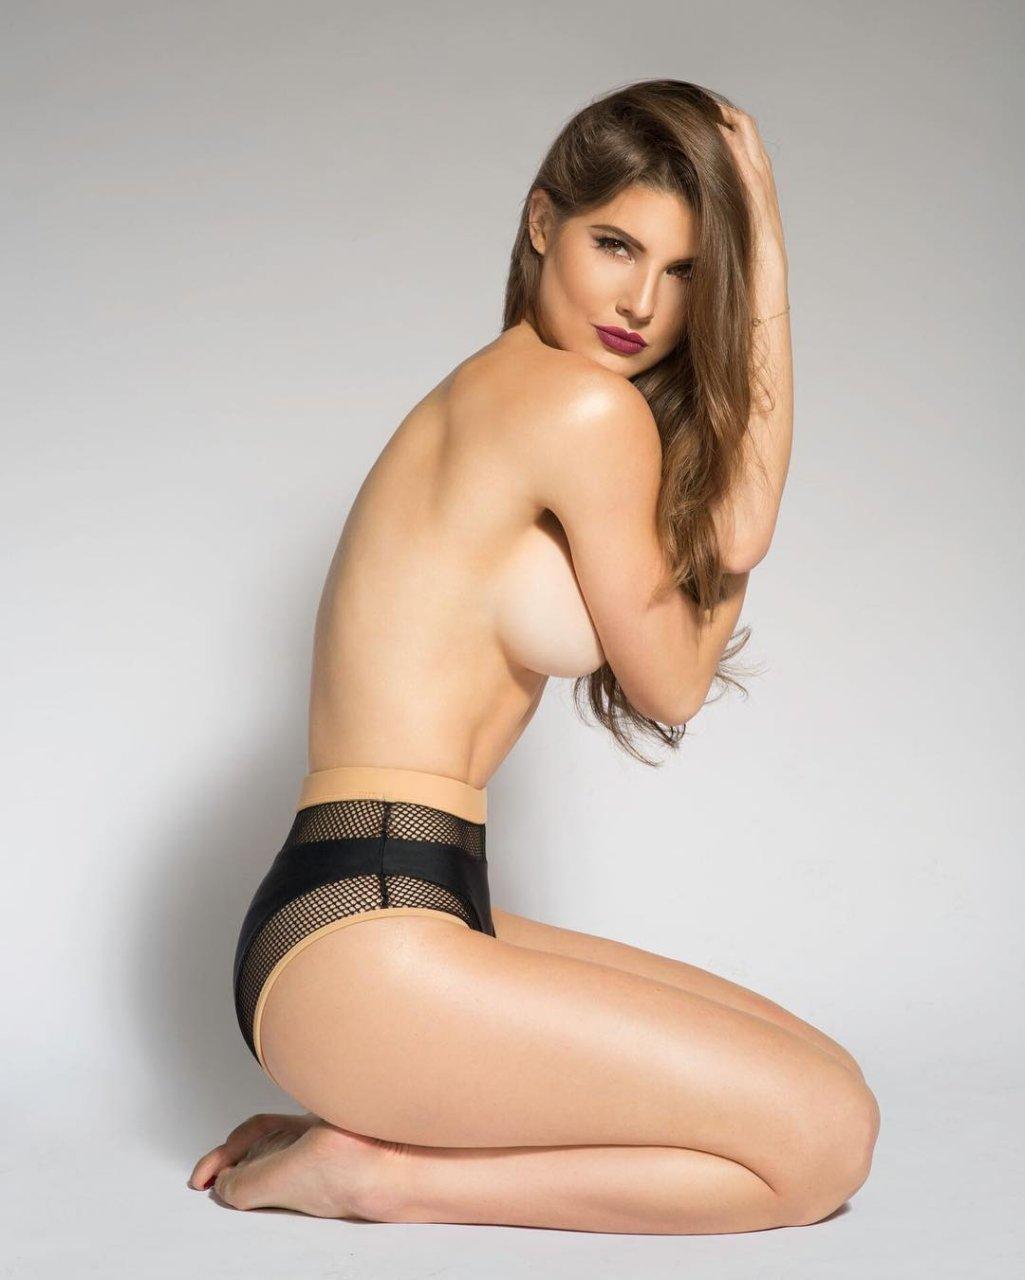 Amanda Cerny Topless amanda cerny nude photos and videos | #thefappening